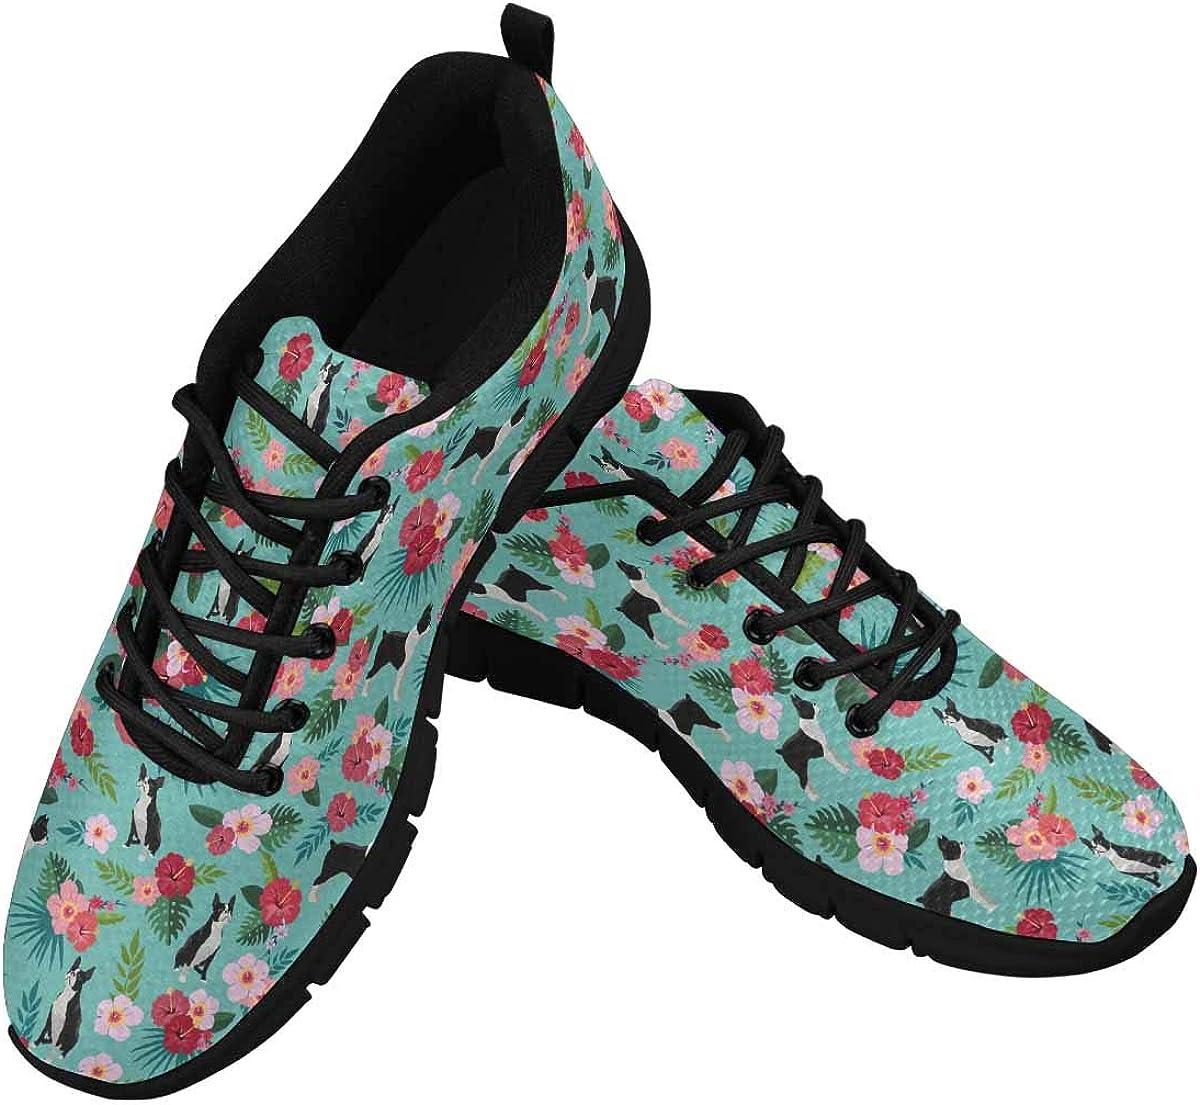 InterestPrint Boston Terrier Floral Dress Women's Athletic Walking Shoes Casual Mesh Comfortable Work Sneakers